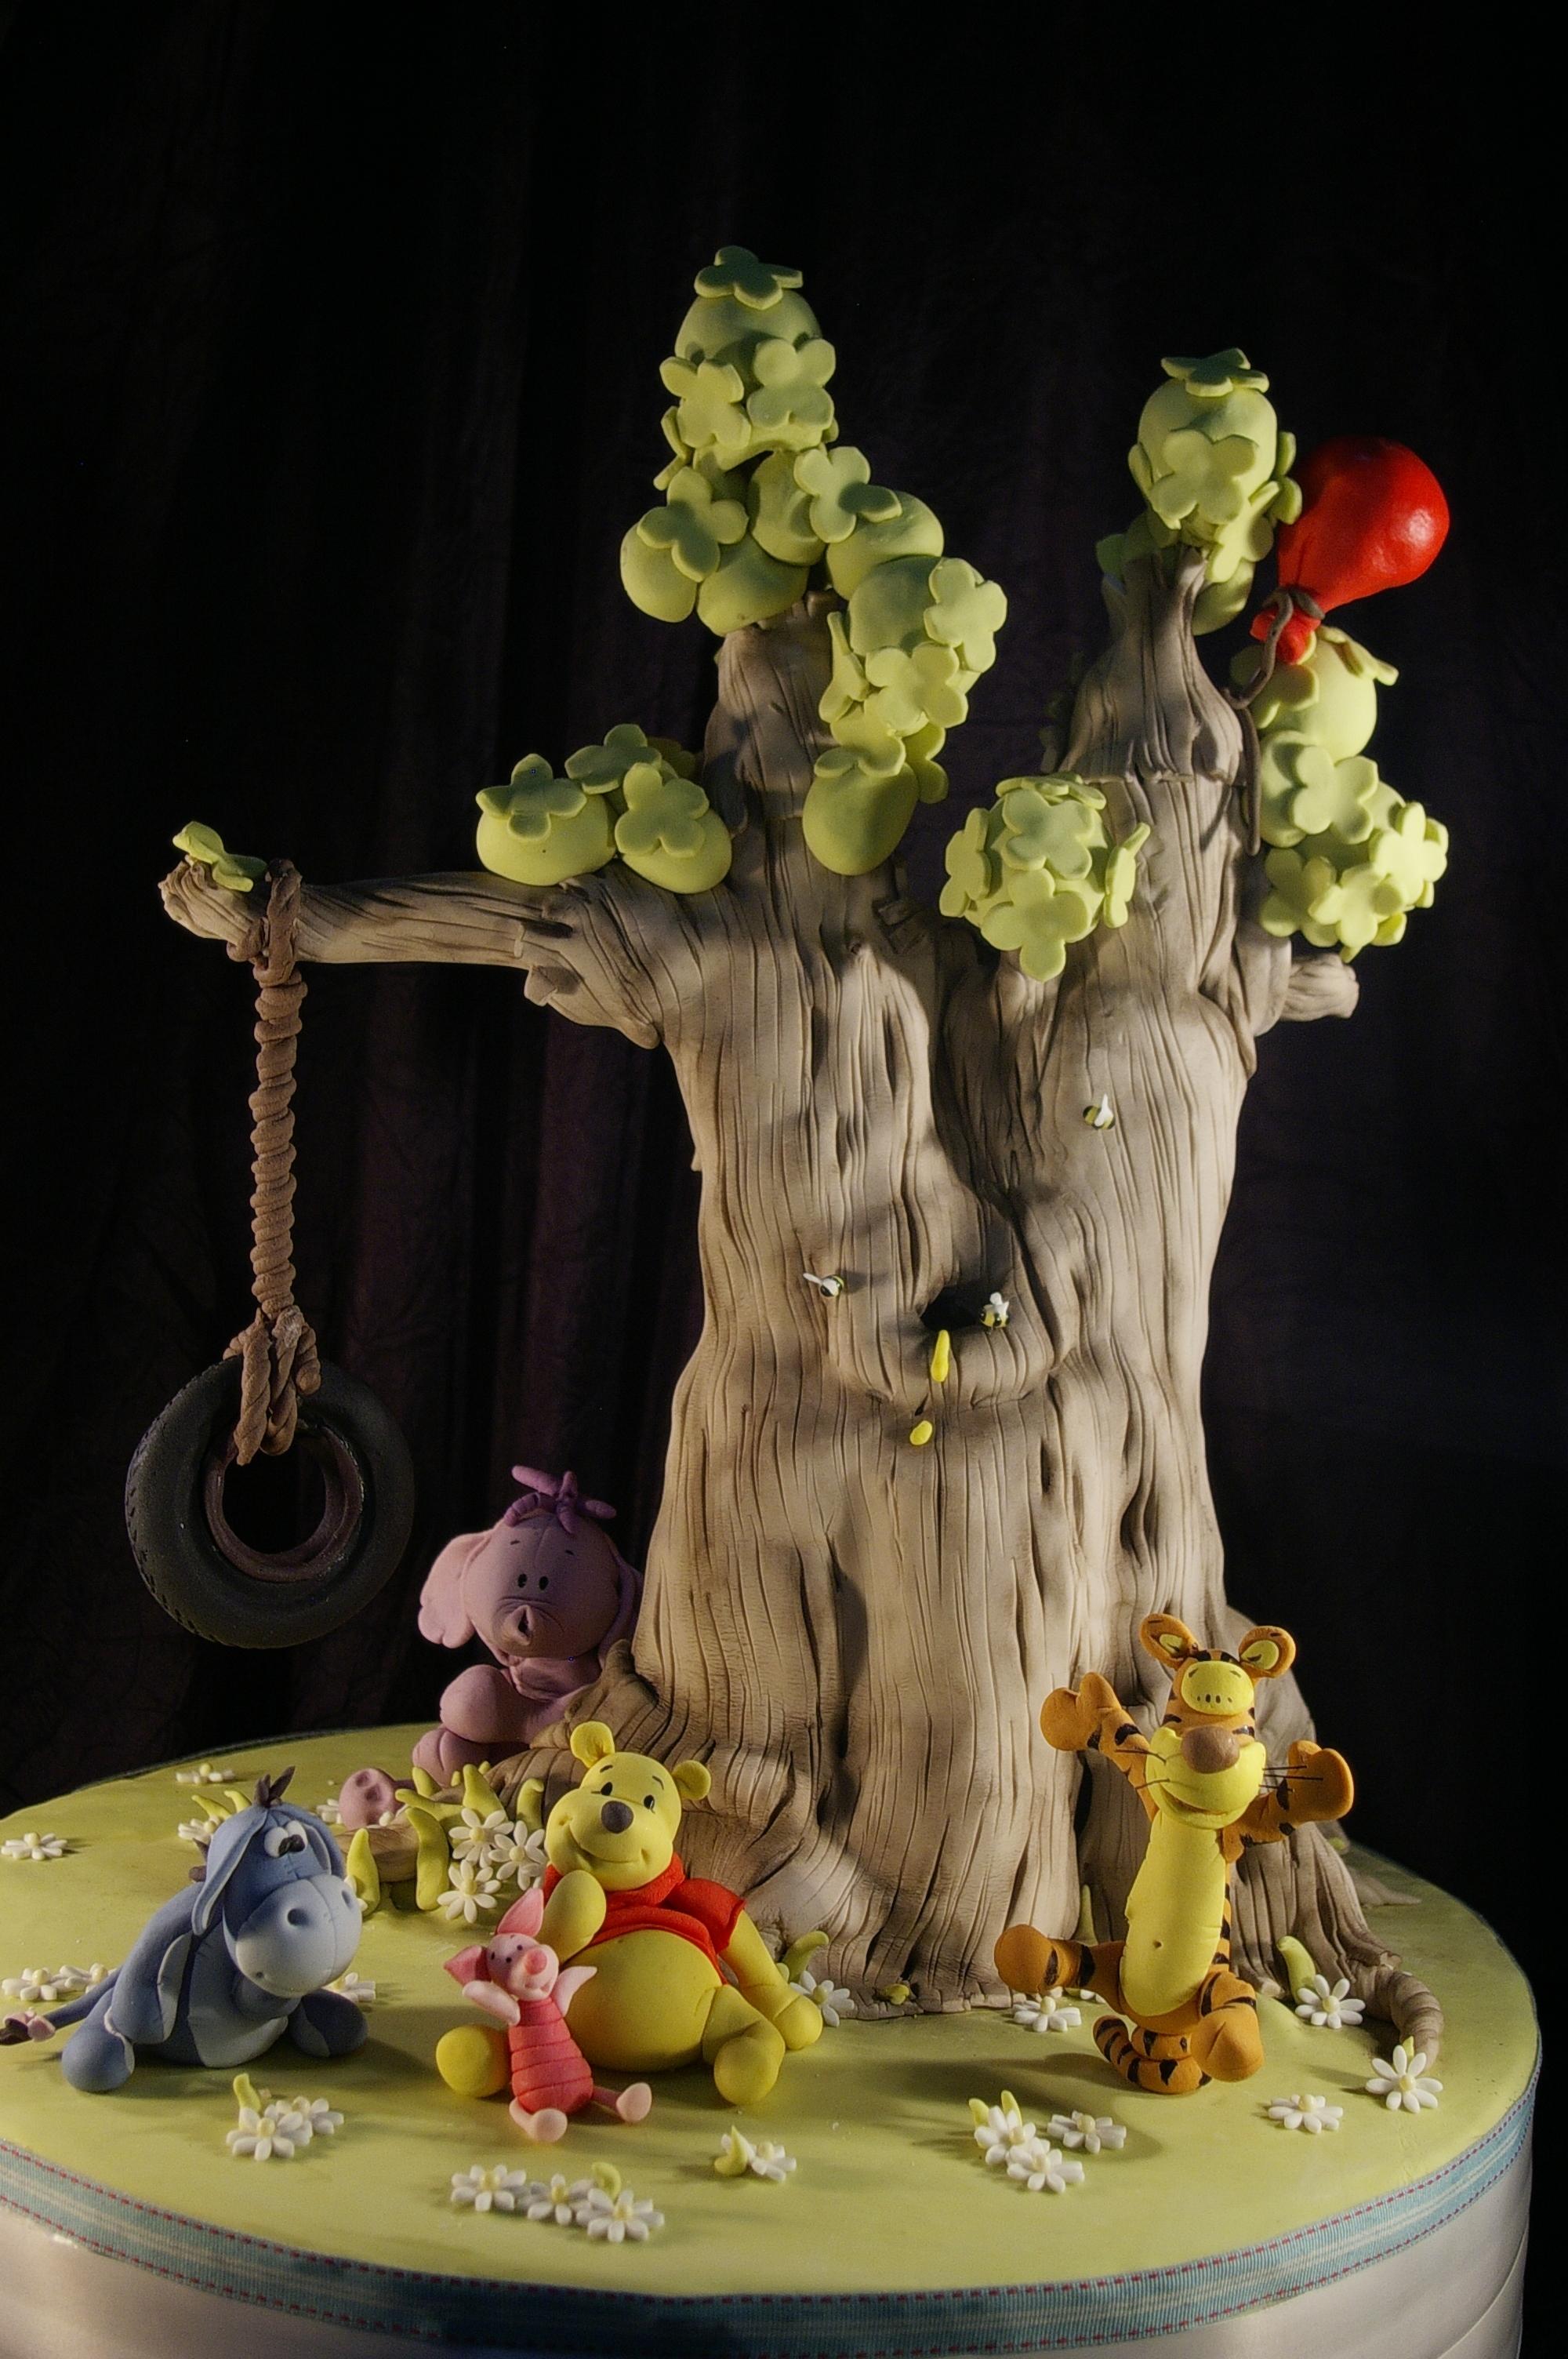 Luca's Winnie the Pooh Tree Cake